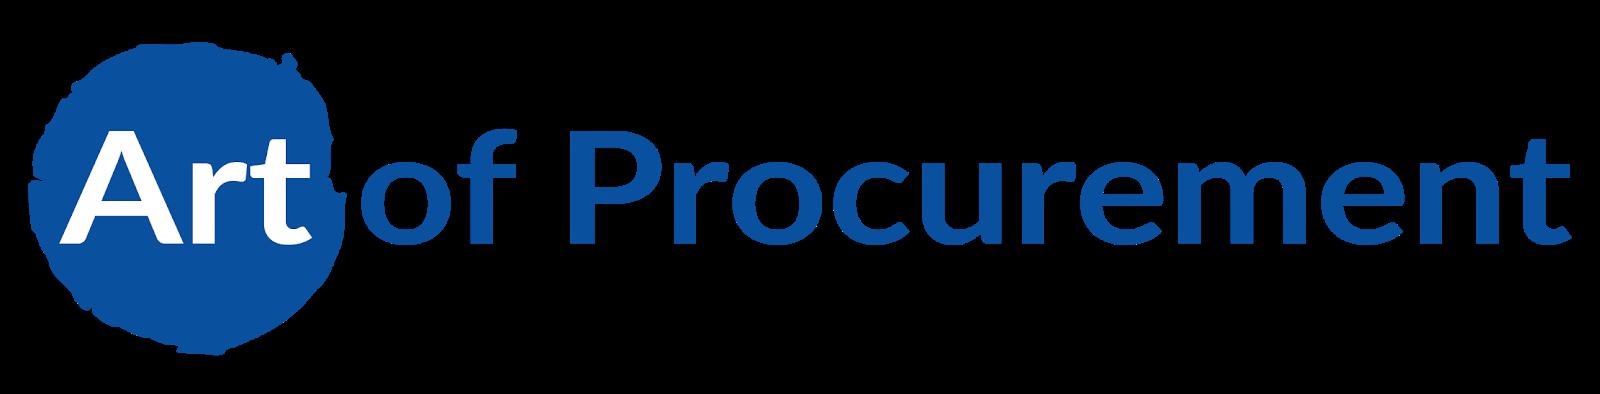 AOP Logo-01.png